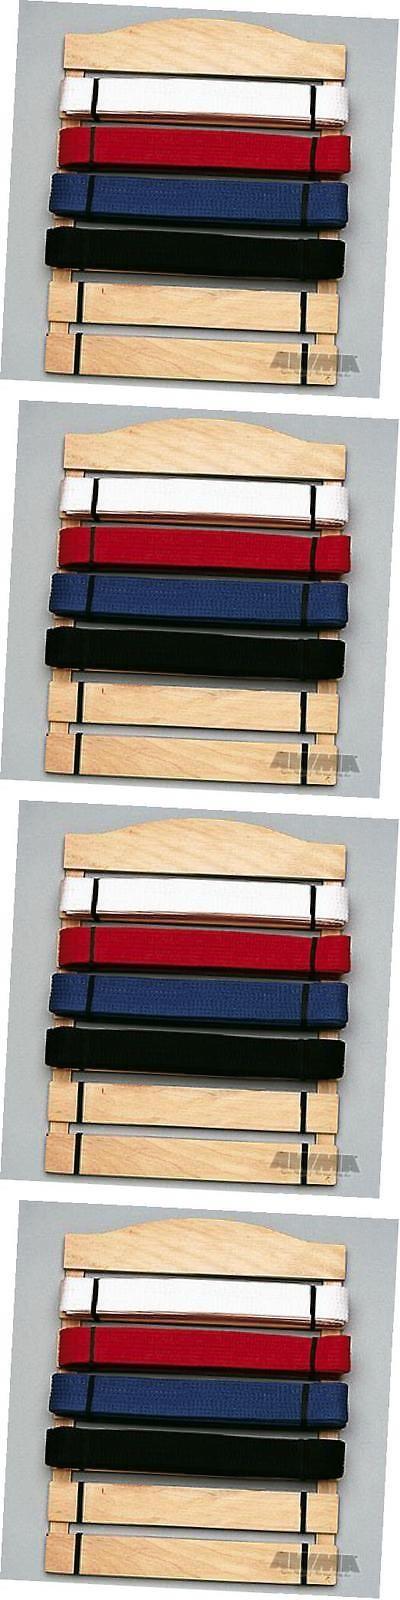 Belt Displays 179768: Karate Belt Display Wood Rack - 6 Belts -> BUY IT NOW ONLY: $34.99 on eBay!